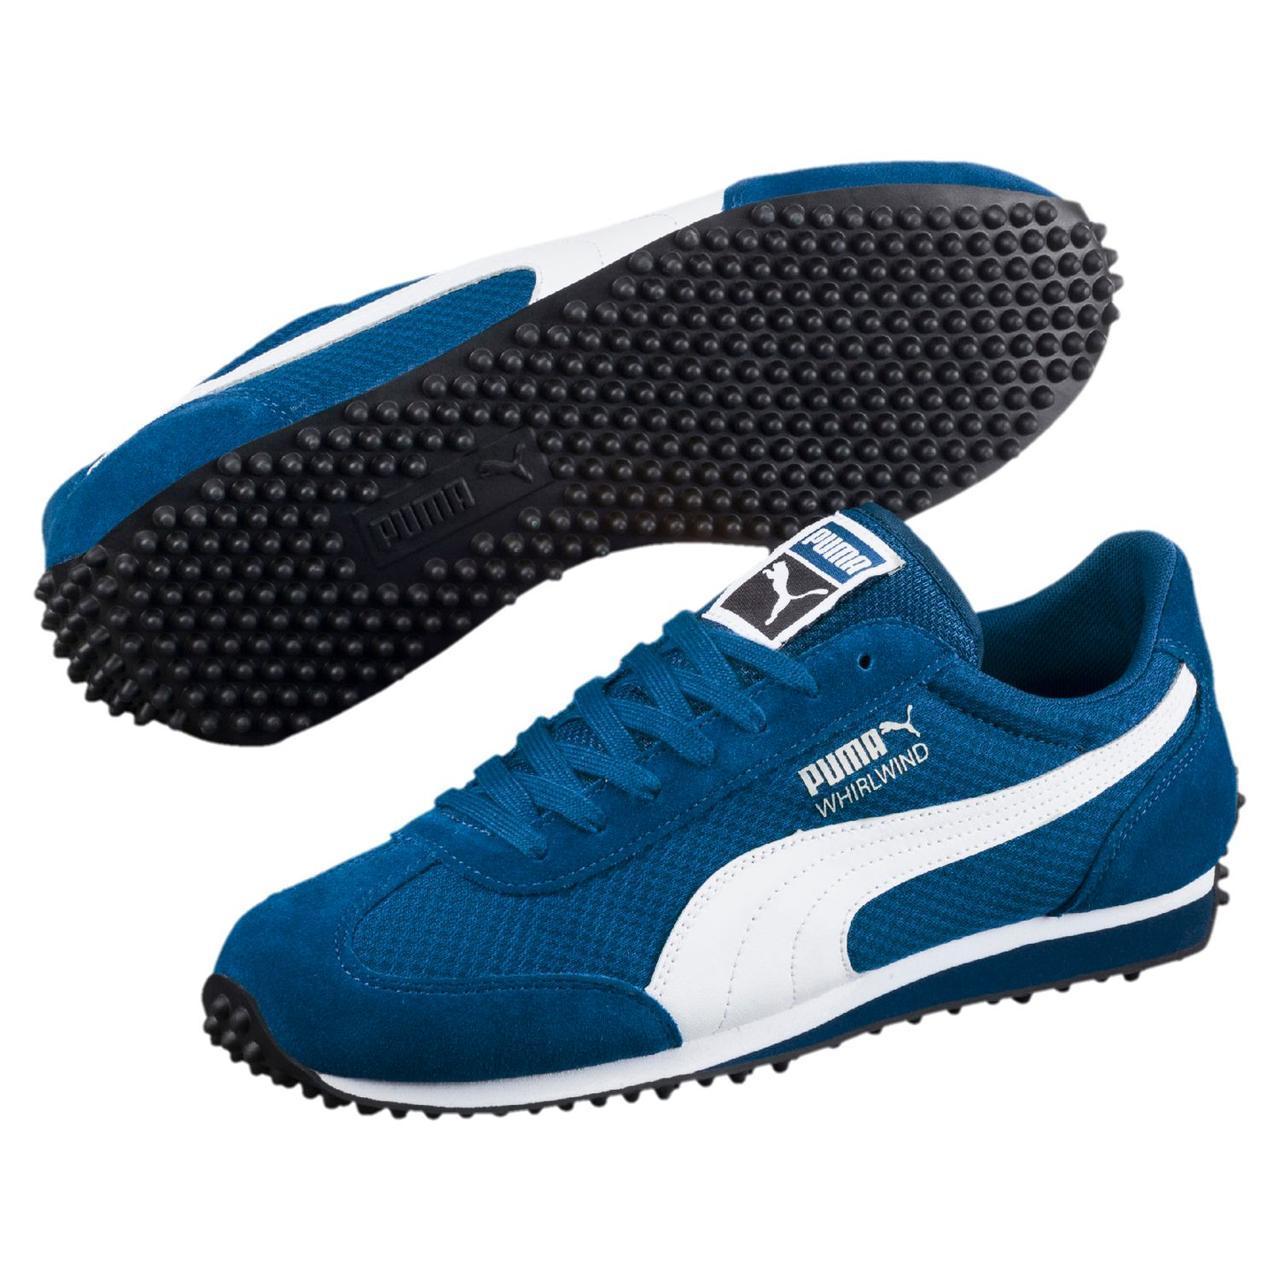 35f3e5e4 Кроссовки мужские Puma Whirlwind 363787-04 - Магазин спортивной одежды и  обуви Max Sport в